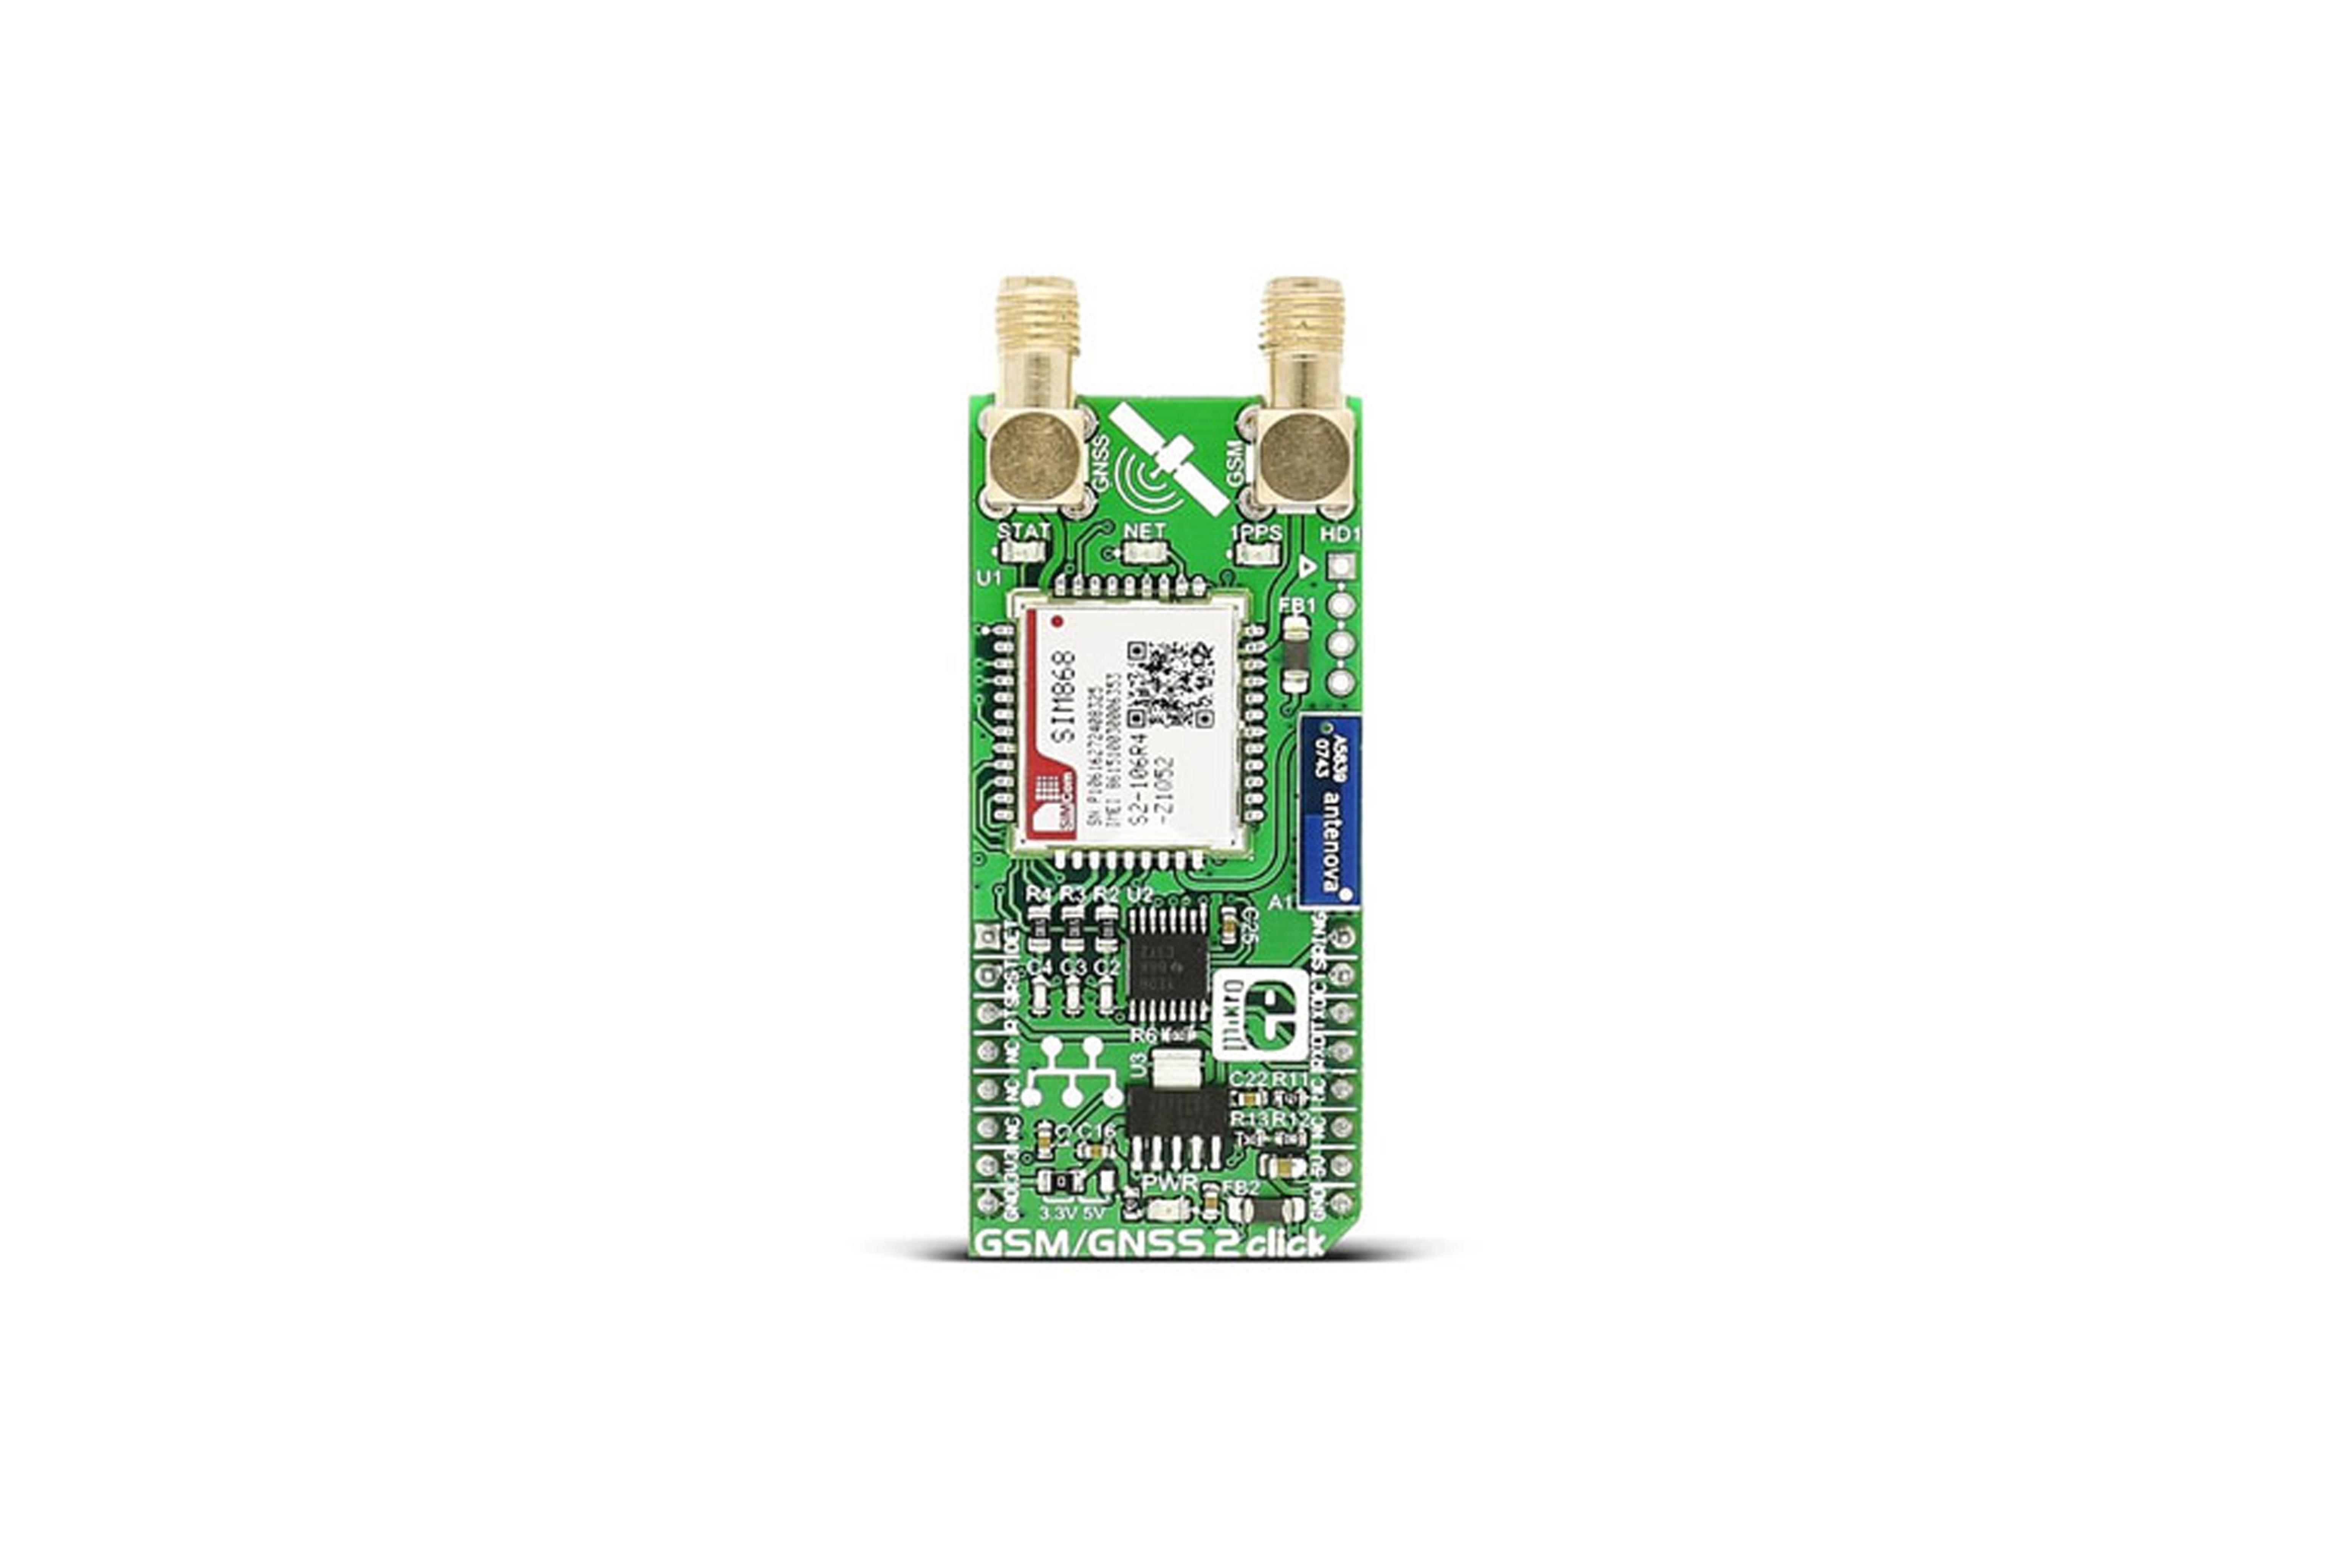 GSM/GNSS 2 CLICK BOARD, MIKROE-2440